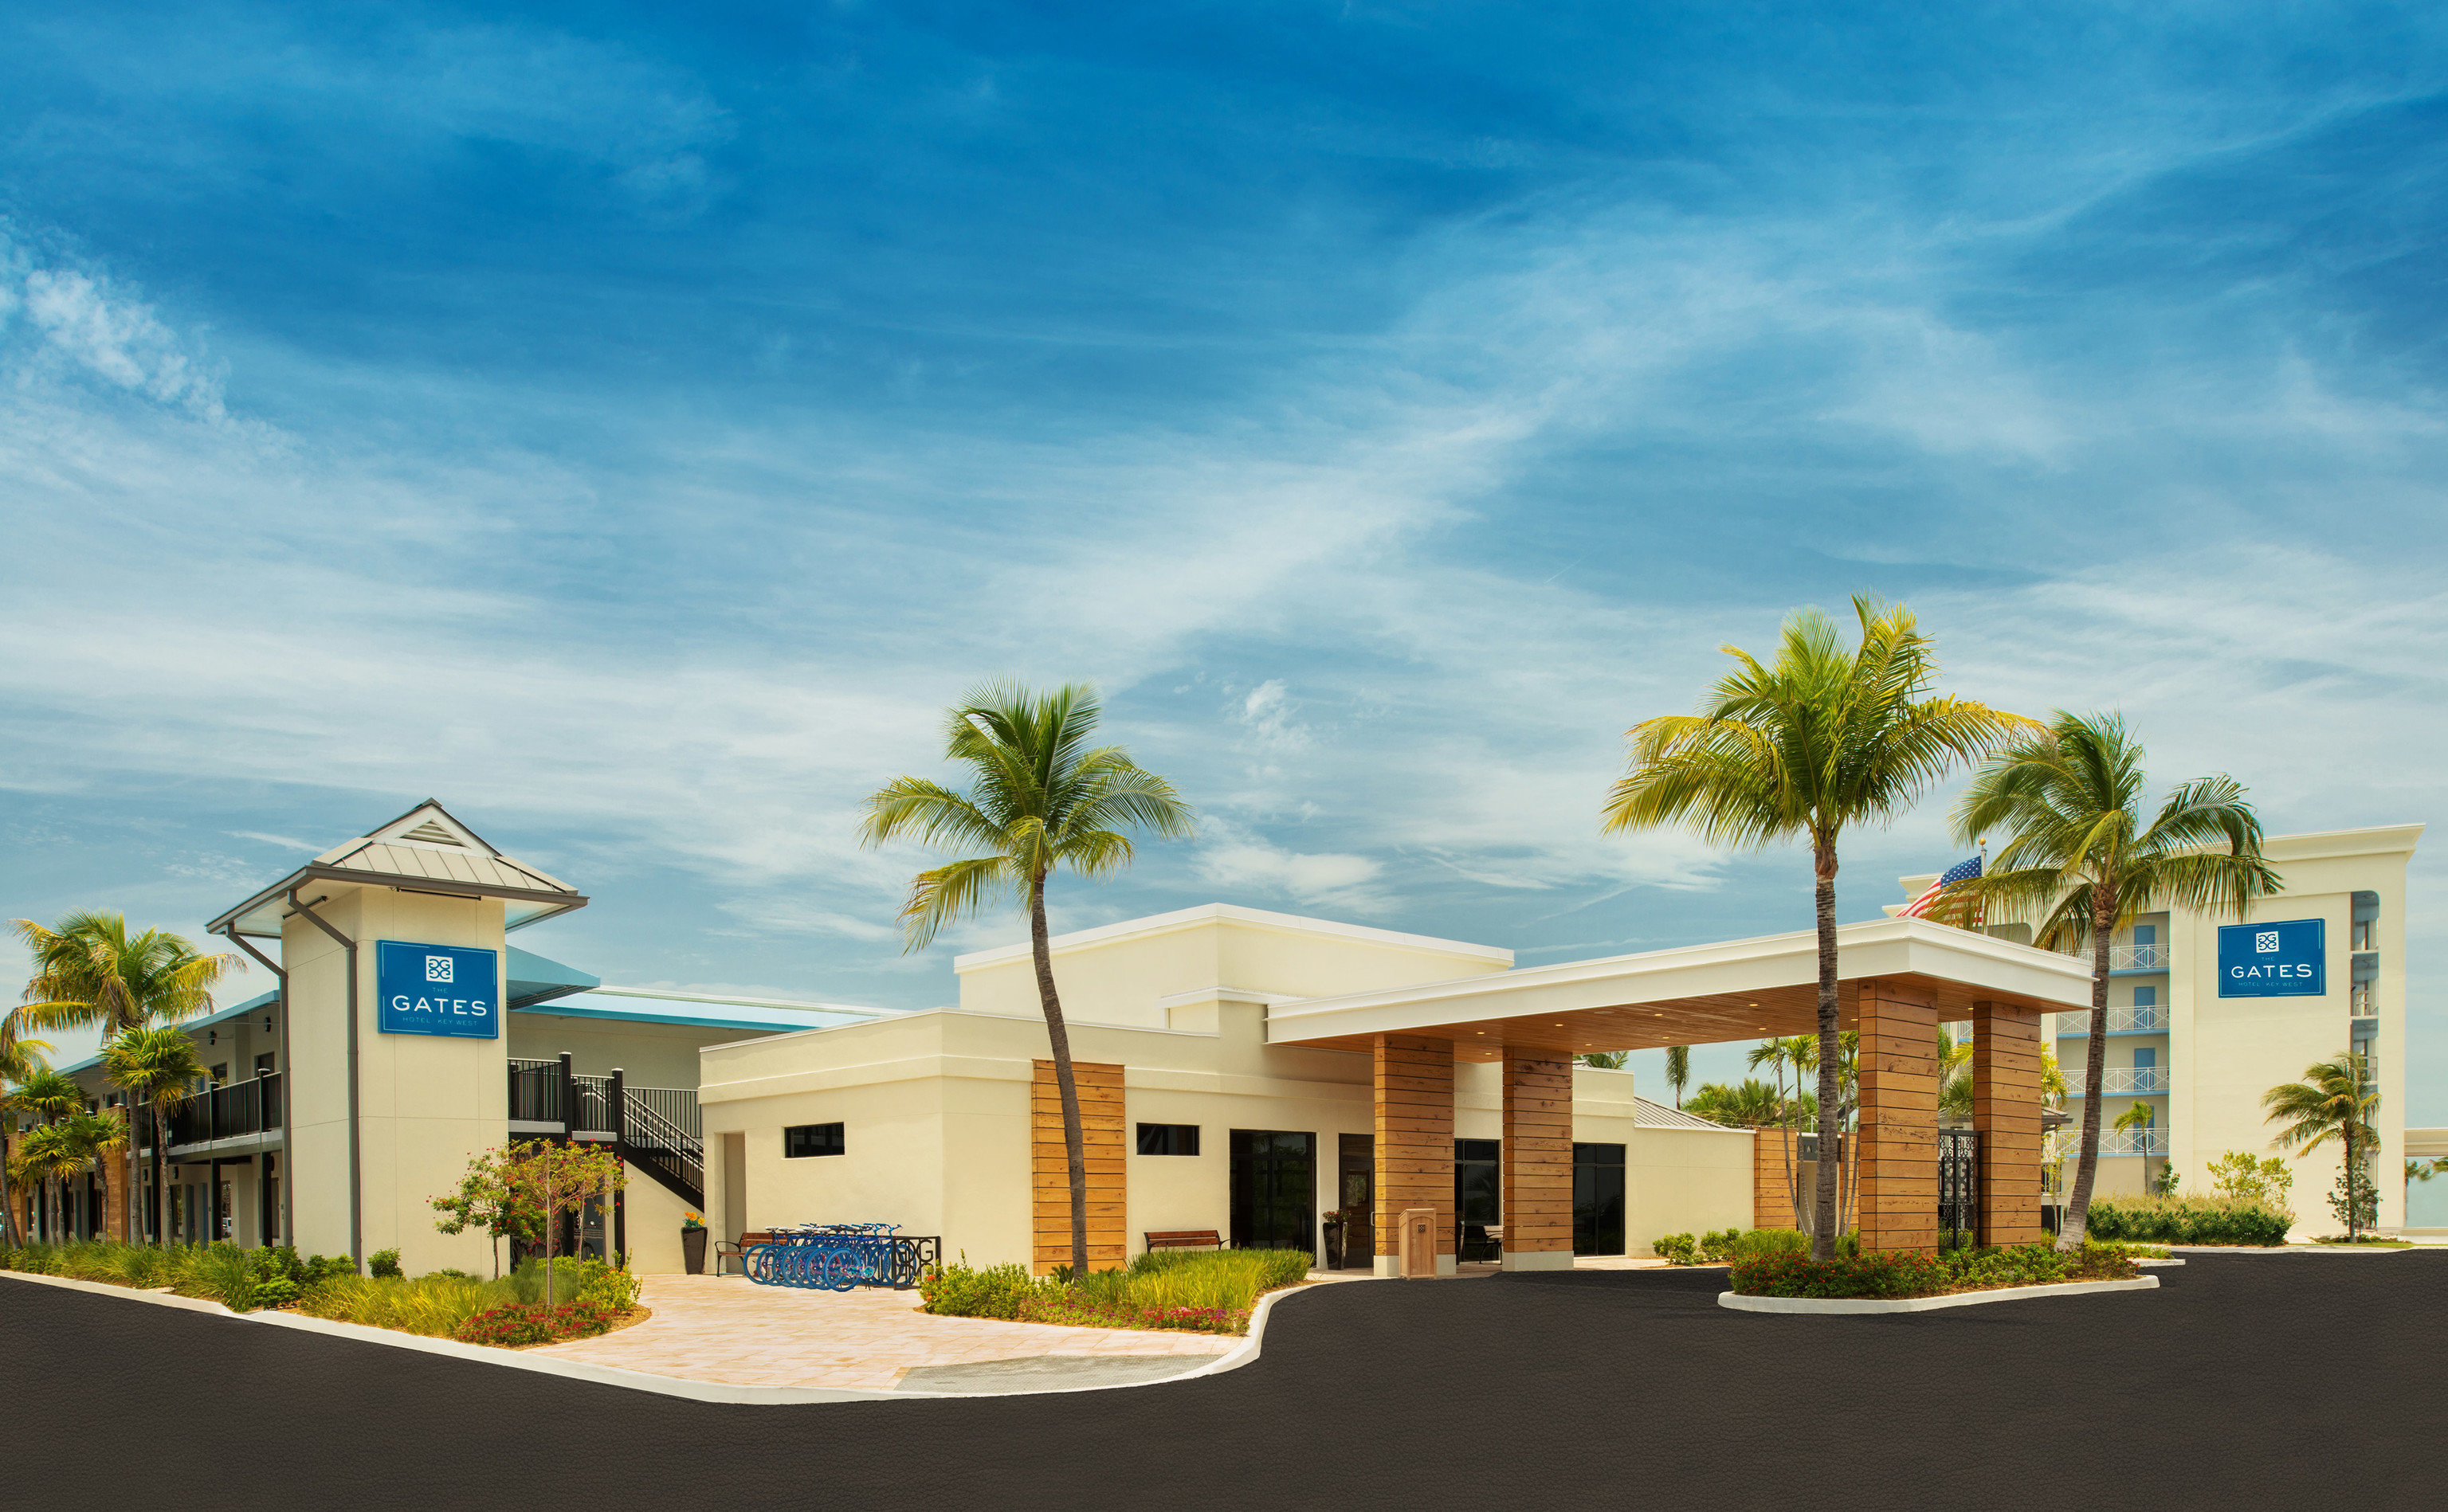 sky property residential area house home neighbourhood suburb condominium Resort sign Town